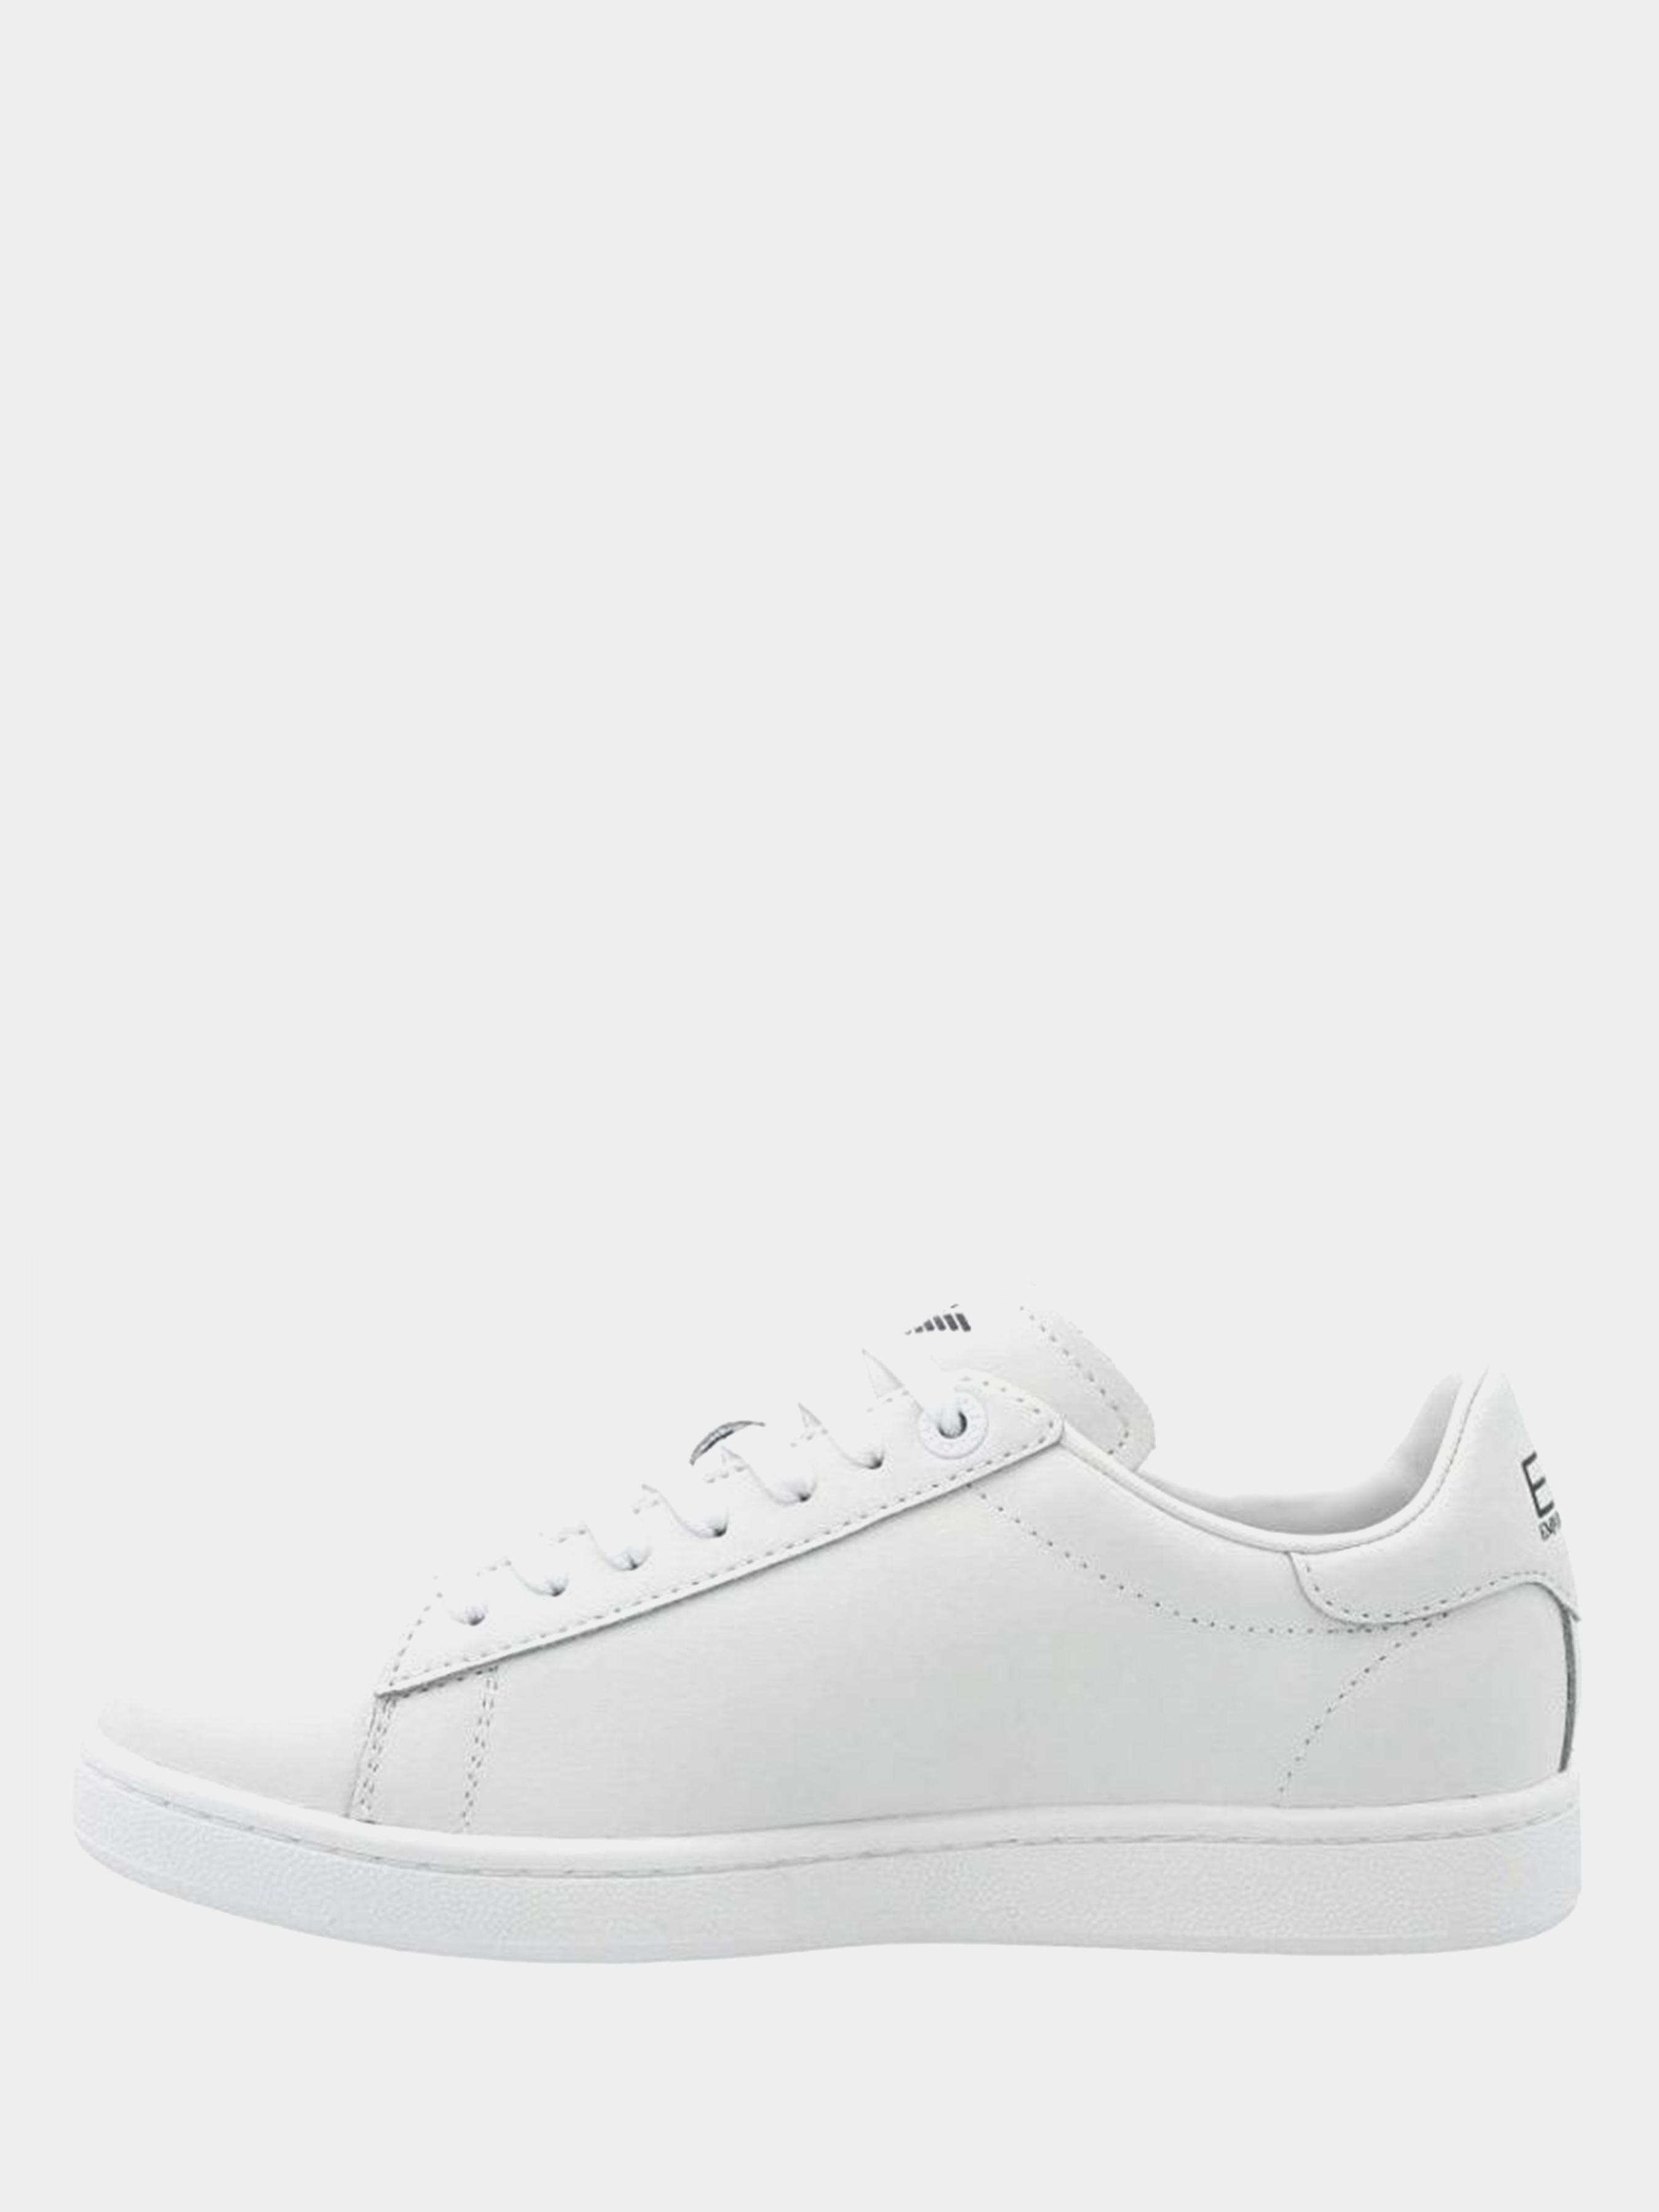 Кроссовки женские EA7 7S13 цена обуви, 2017